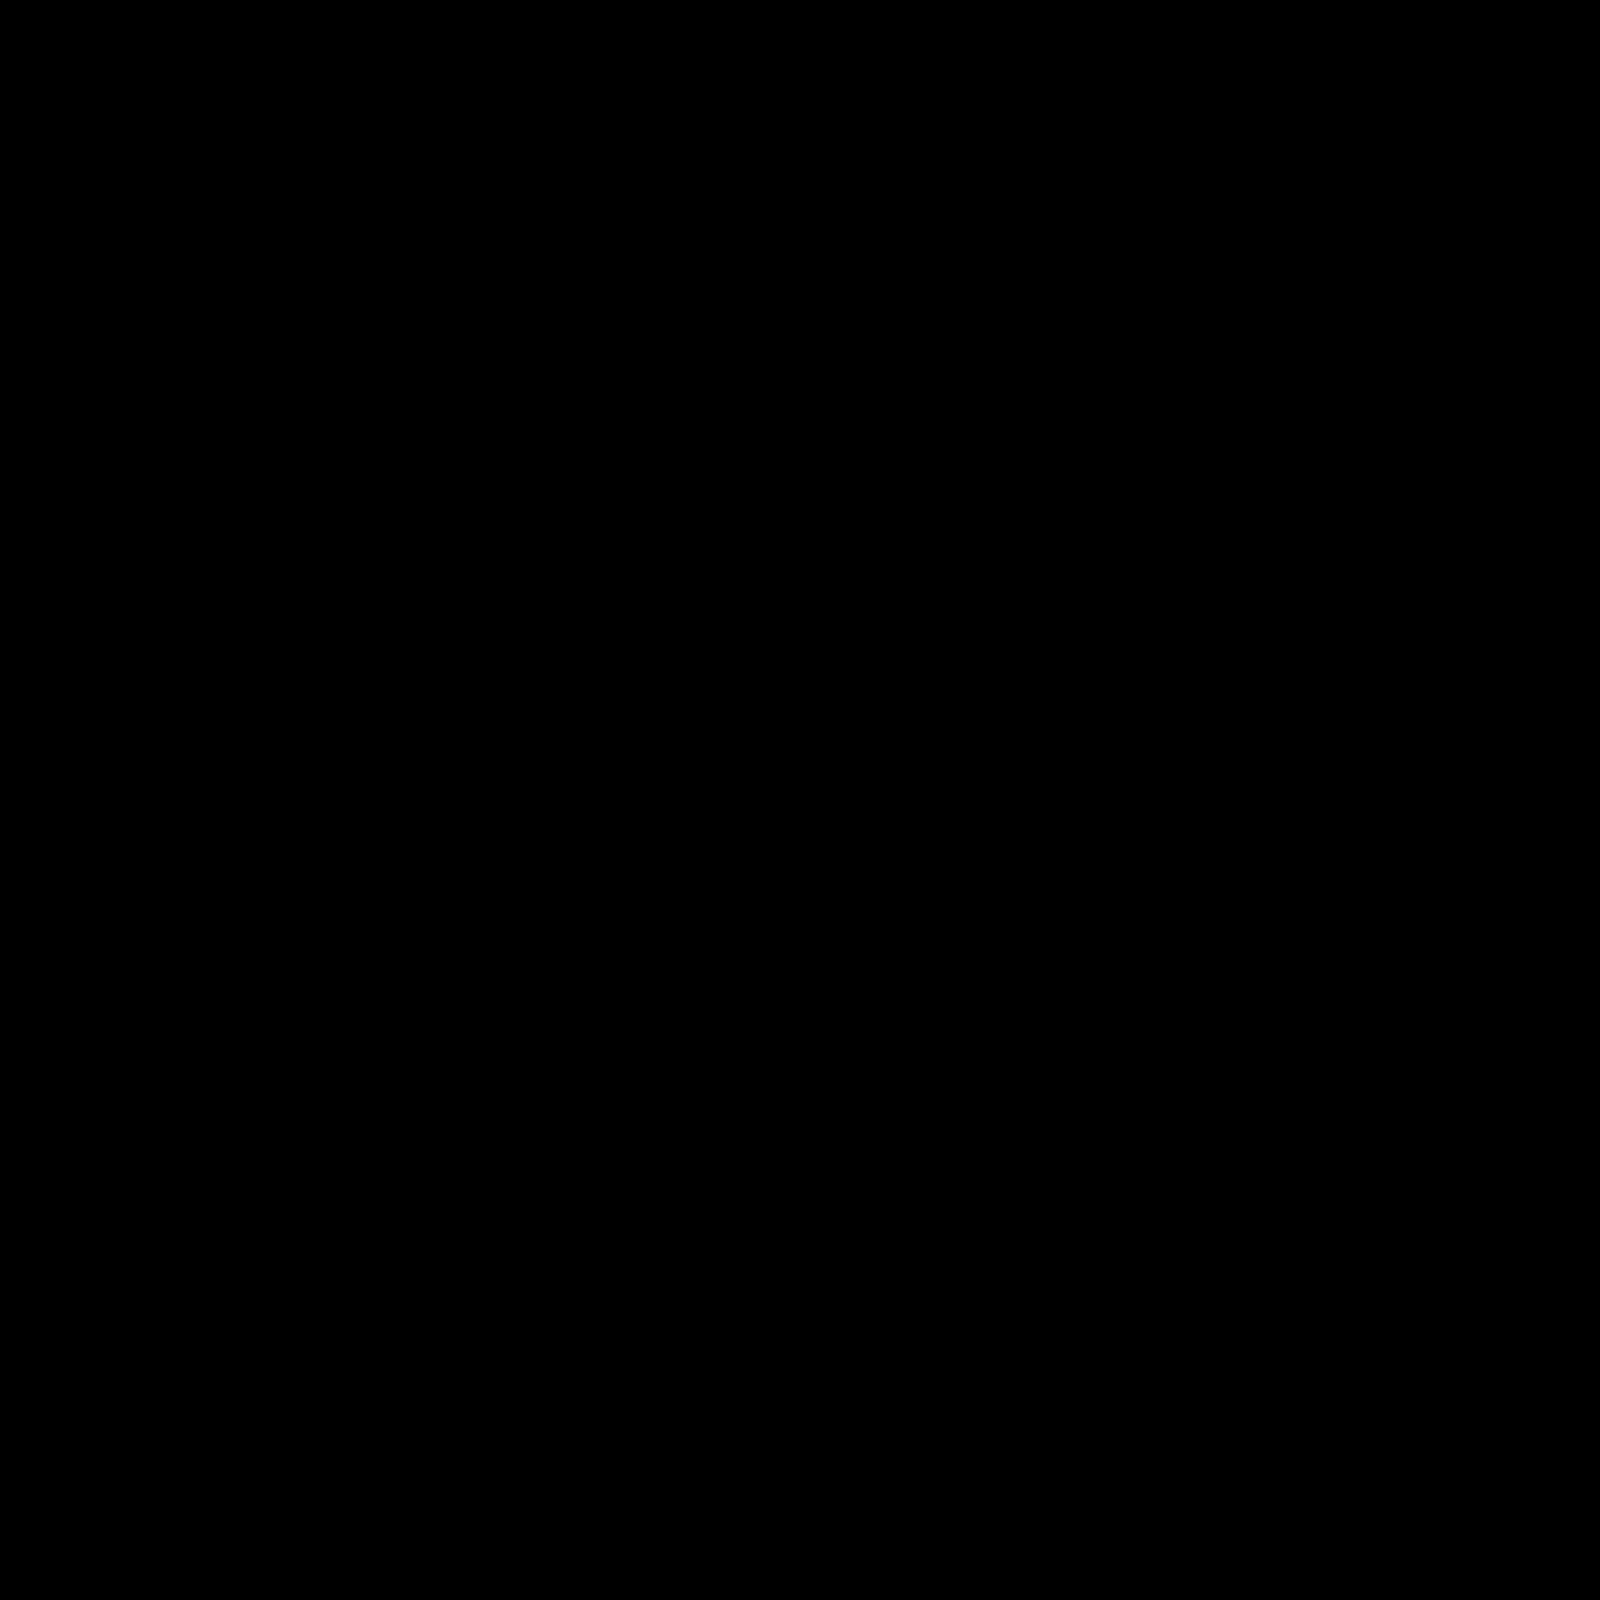 kapelusz trilby icon